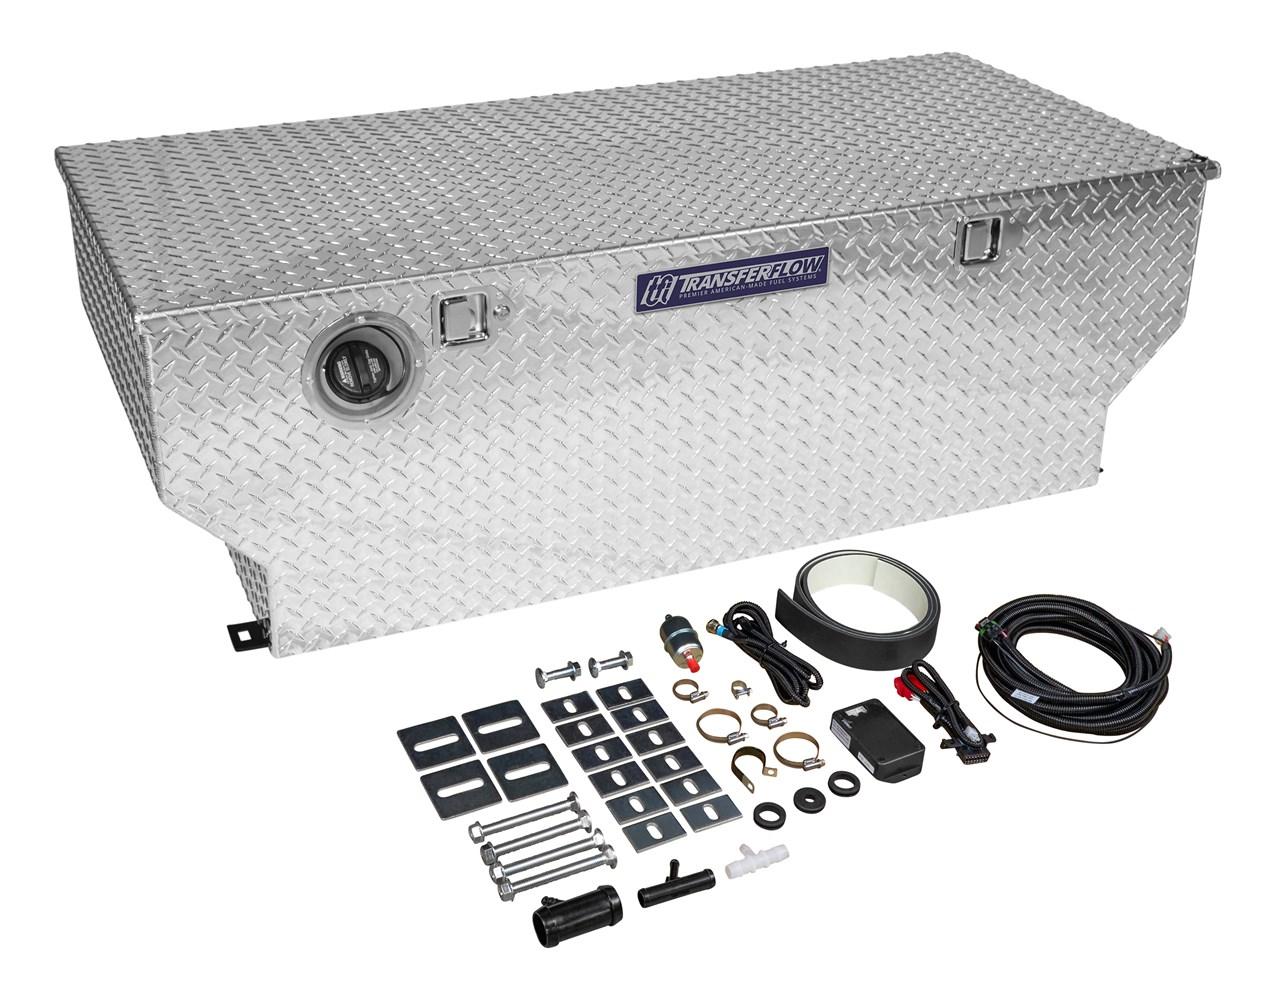 50 Gallon Fuel Tank And Tool Box Combo Trax 3 Transfer Flow Inc Ram Filter 0800116187